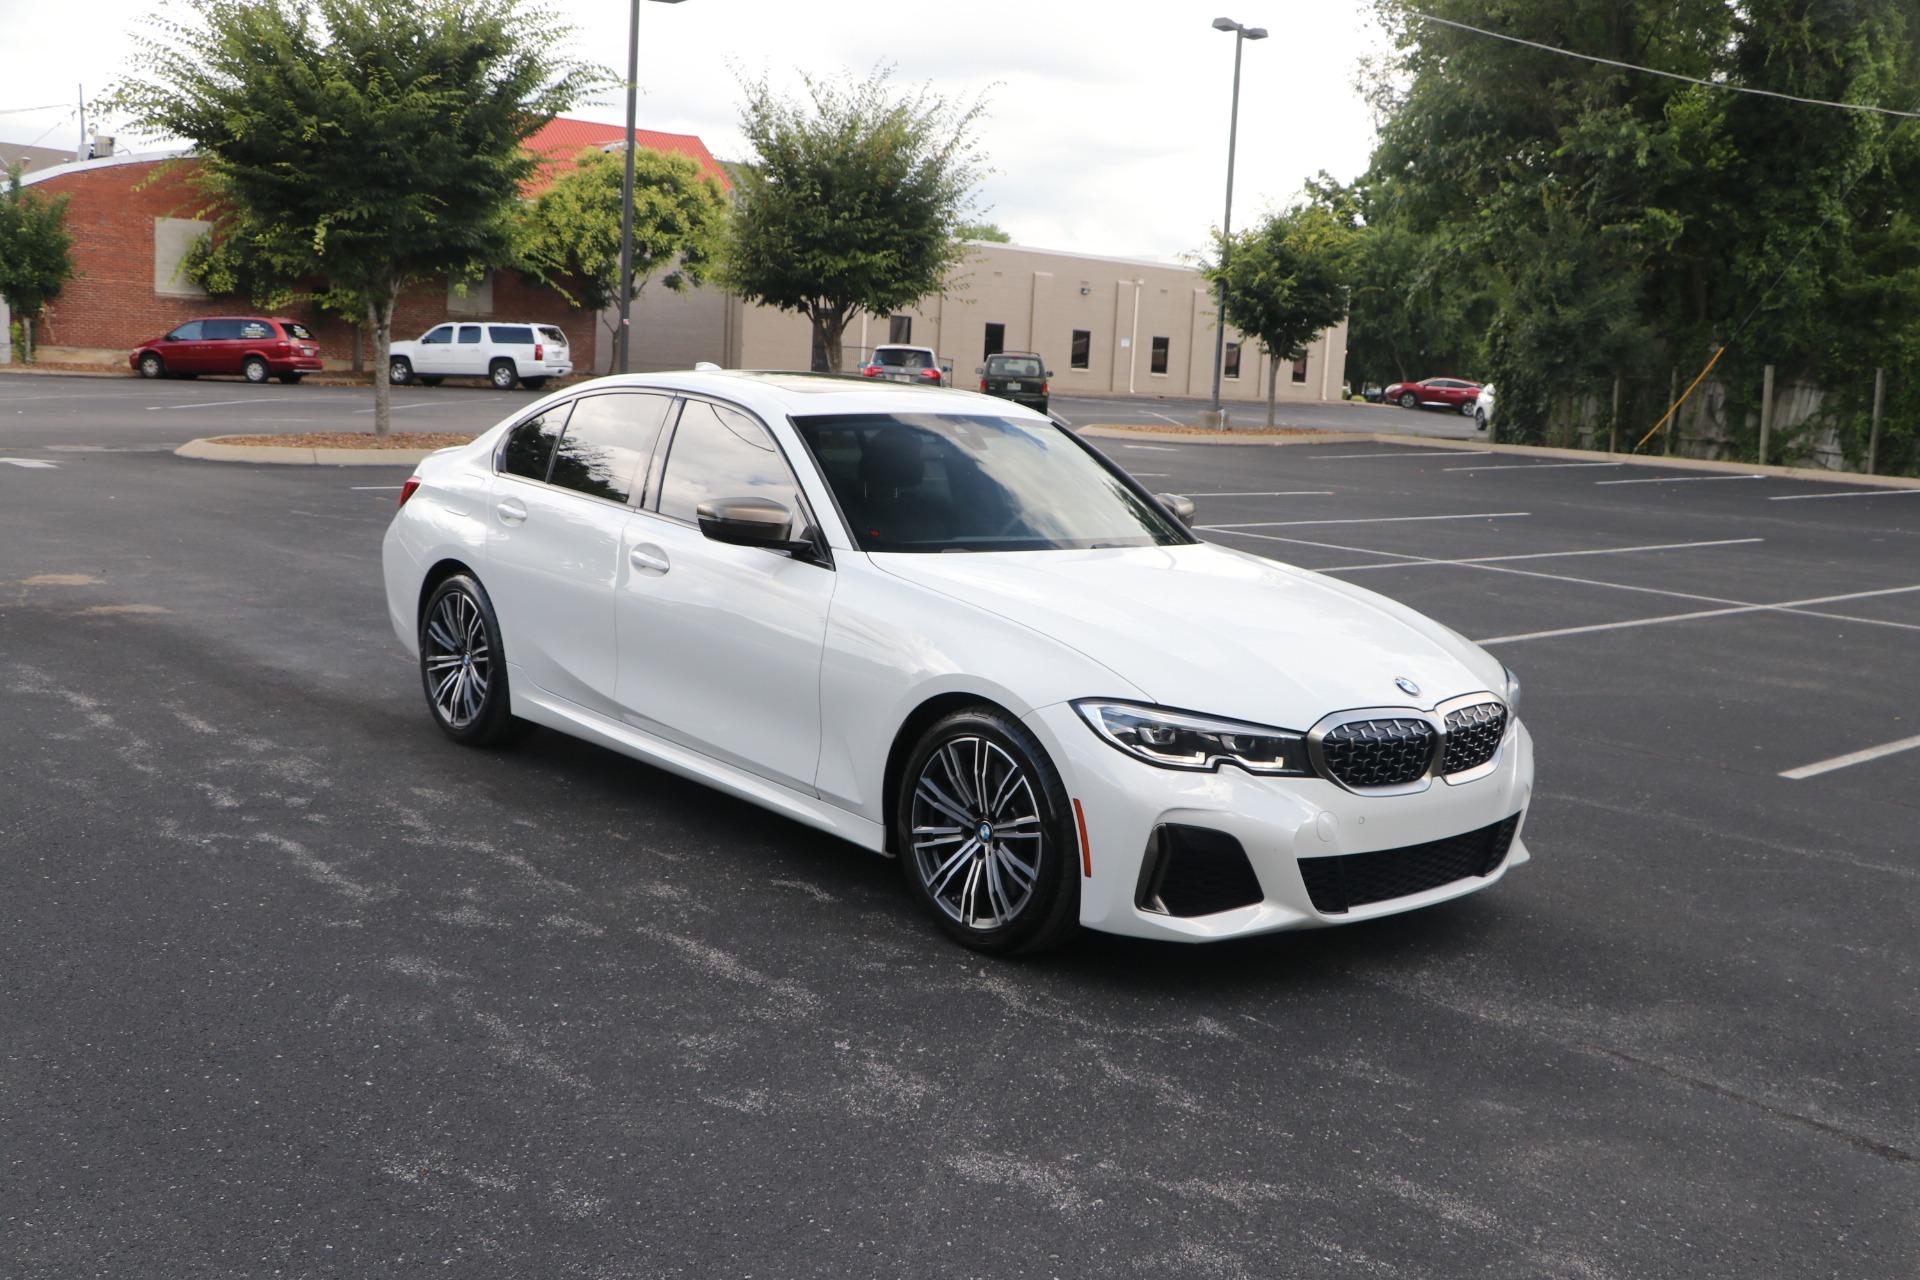 Used 2020 BMW M340I SEDAN RWD W/NAV for sale $51,950 at Auto Collection in Murfreesboro TN 37130 1